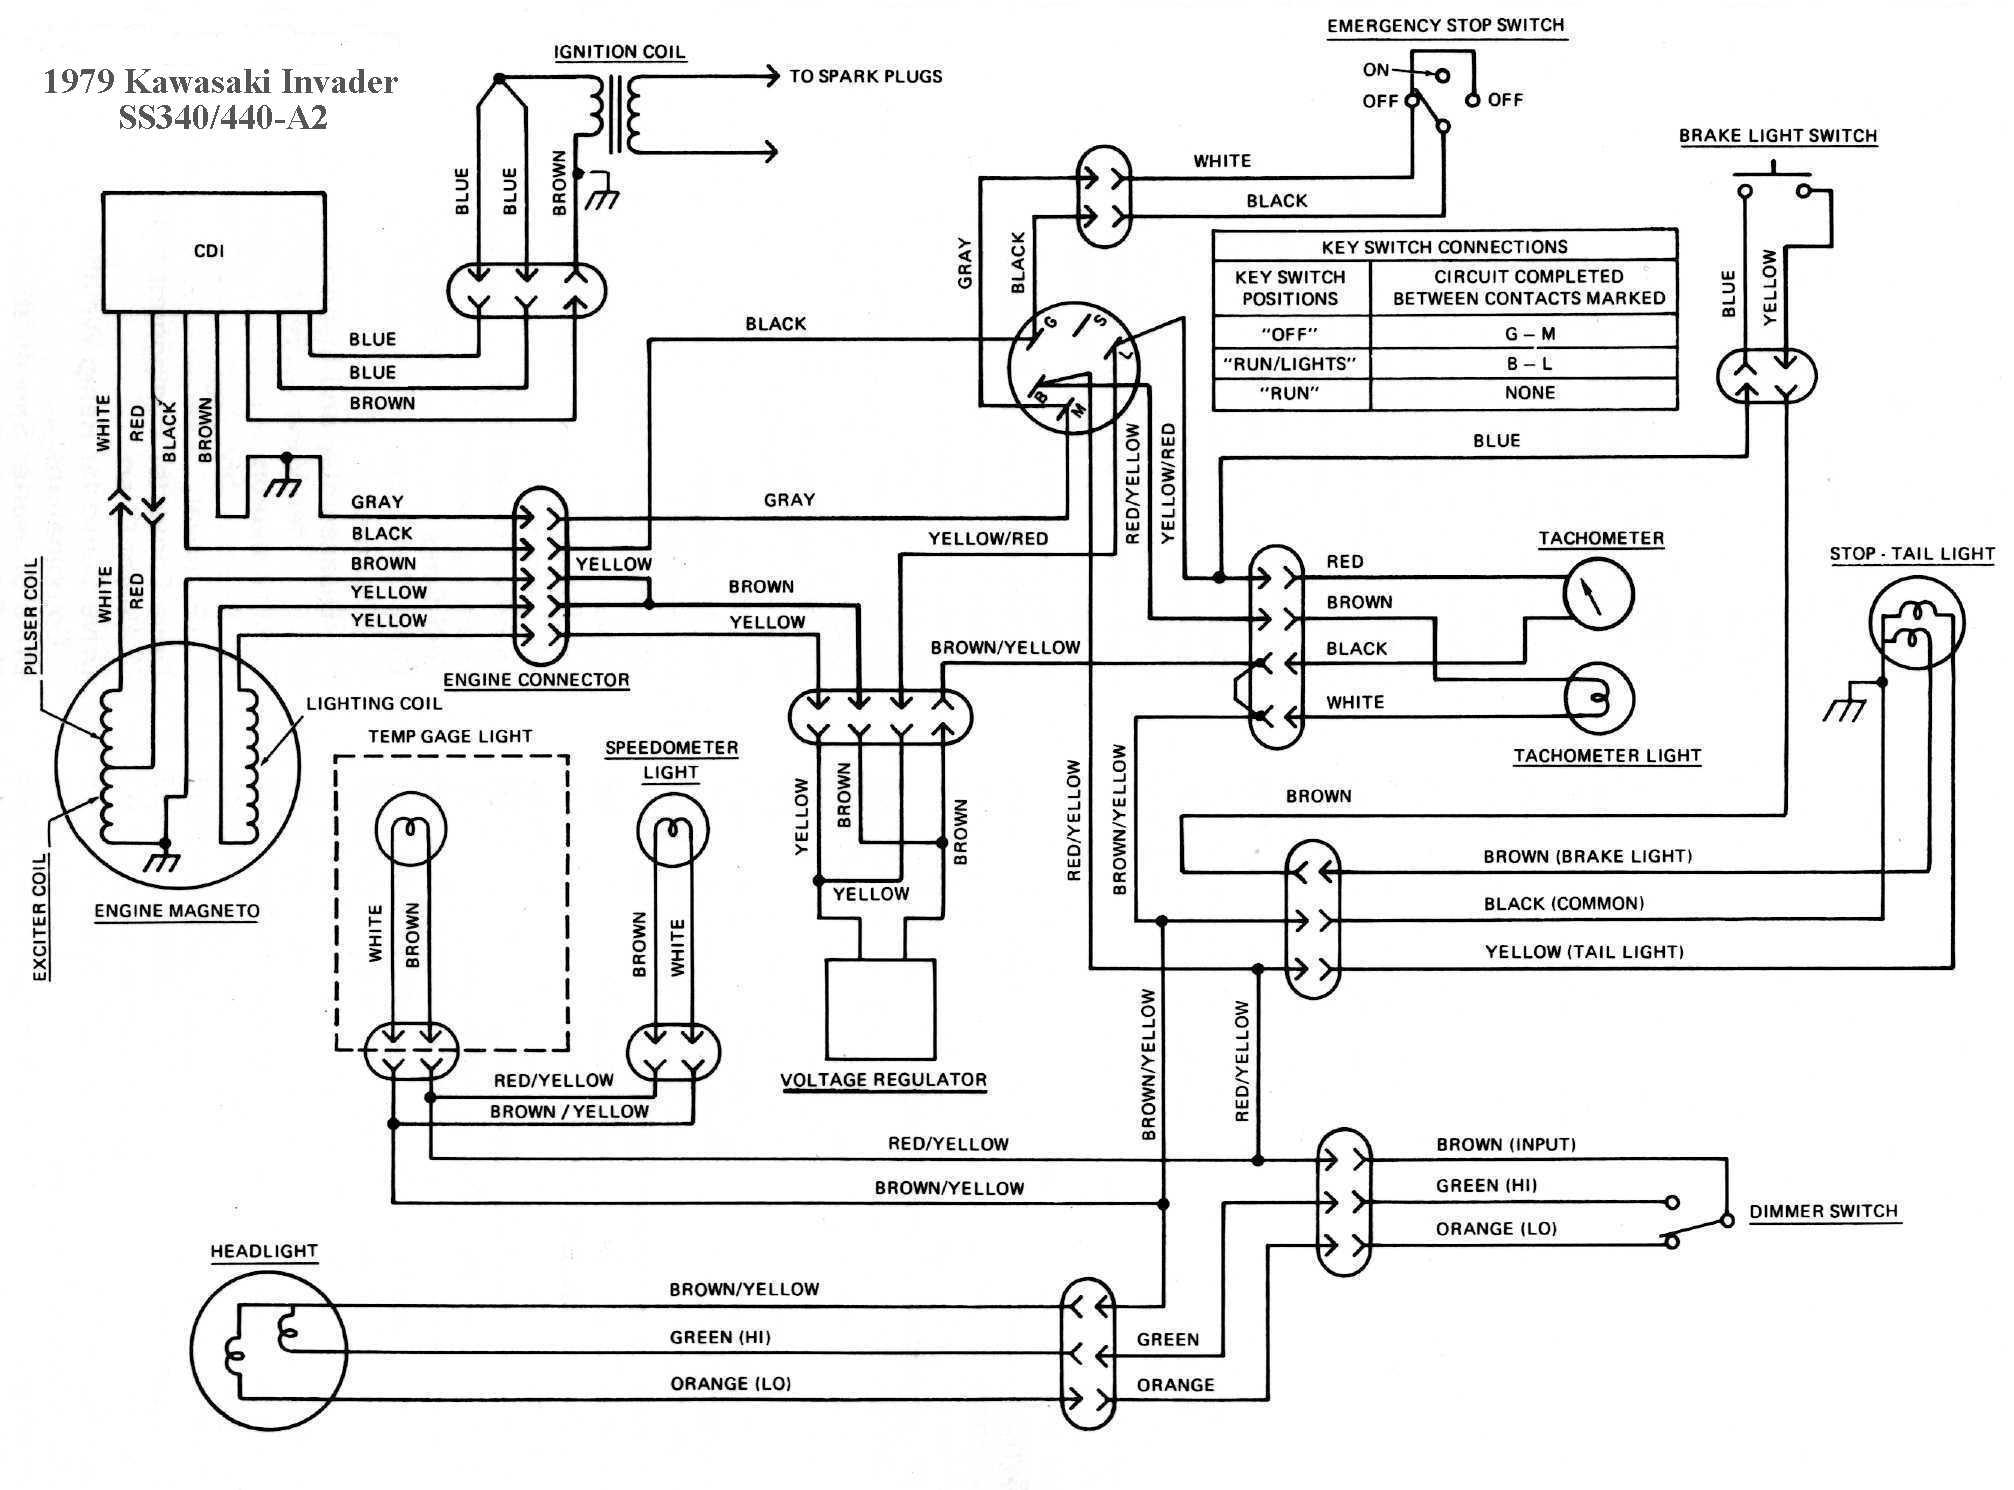 Kawasaki Bayou 220 Wiring Harness Diagram - Wiring Diagram Data - Kawasaki Bayou 220 Wiring Diagram